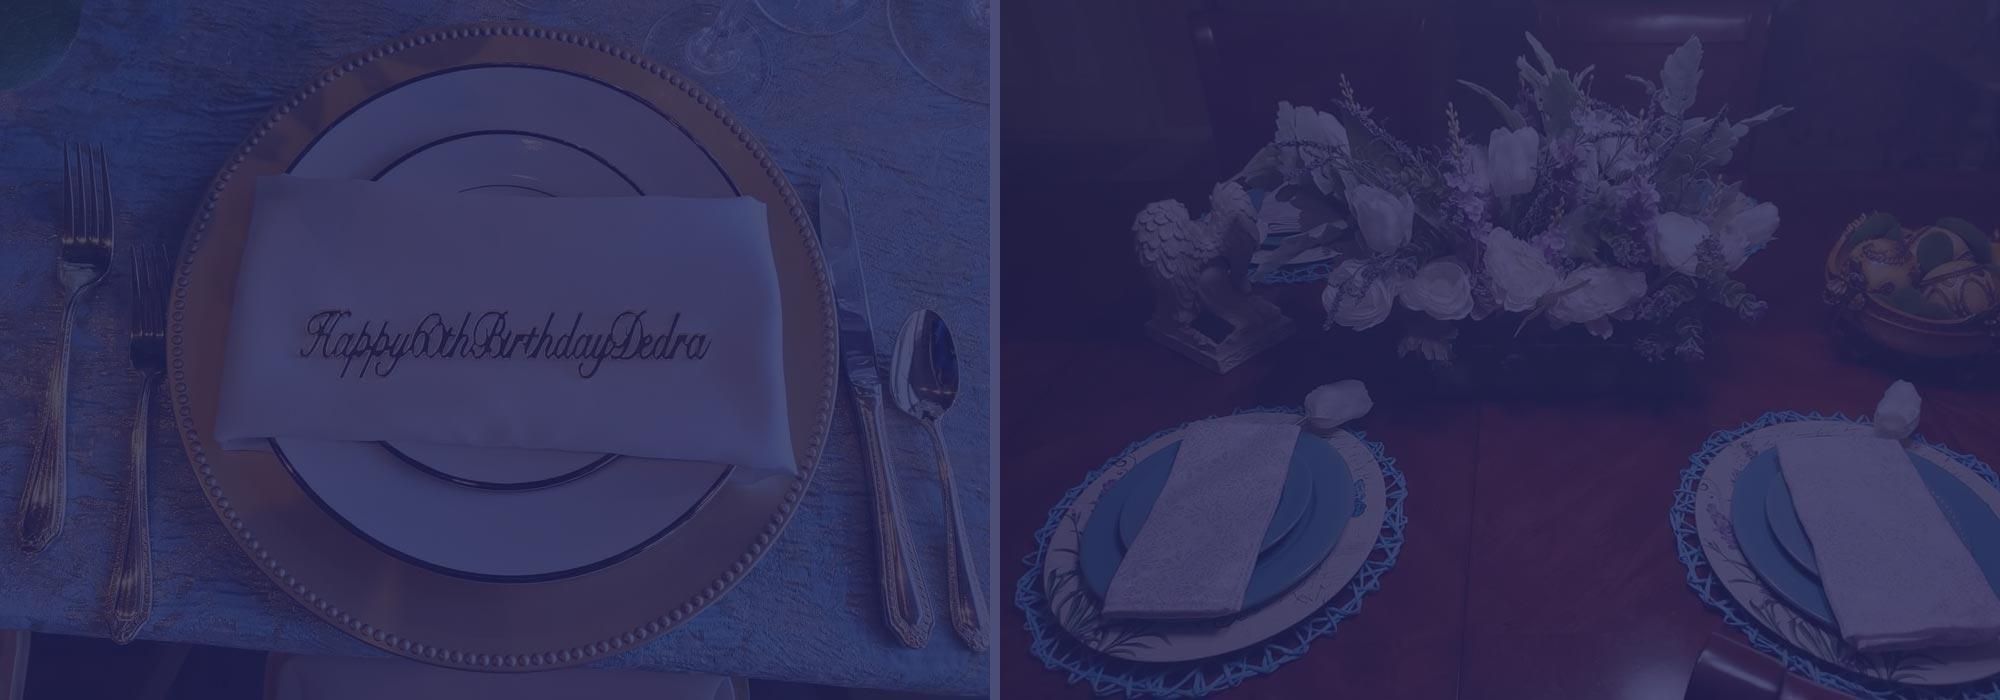 regal wedding and event decor